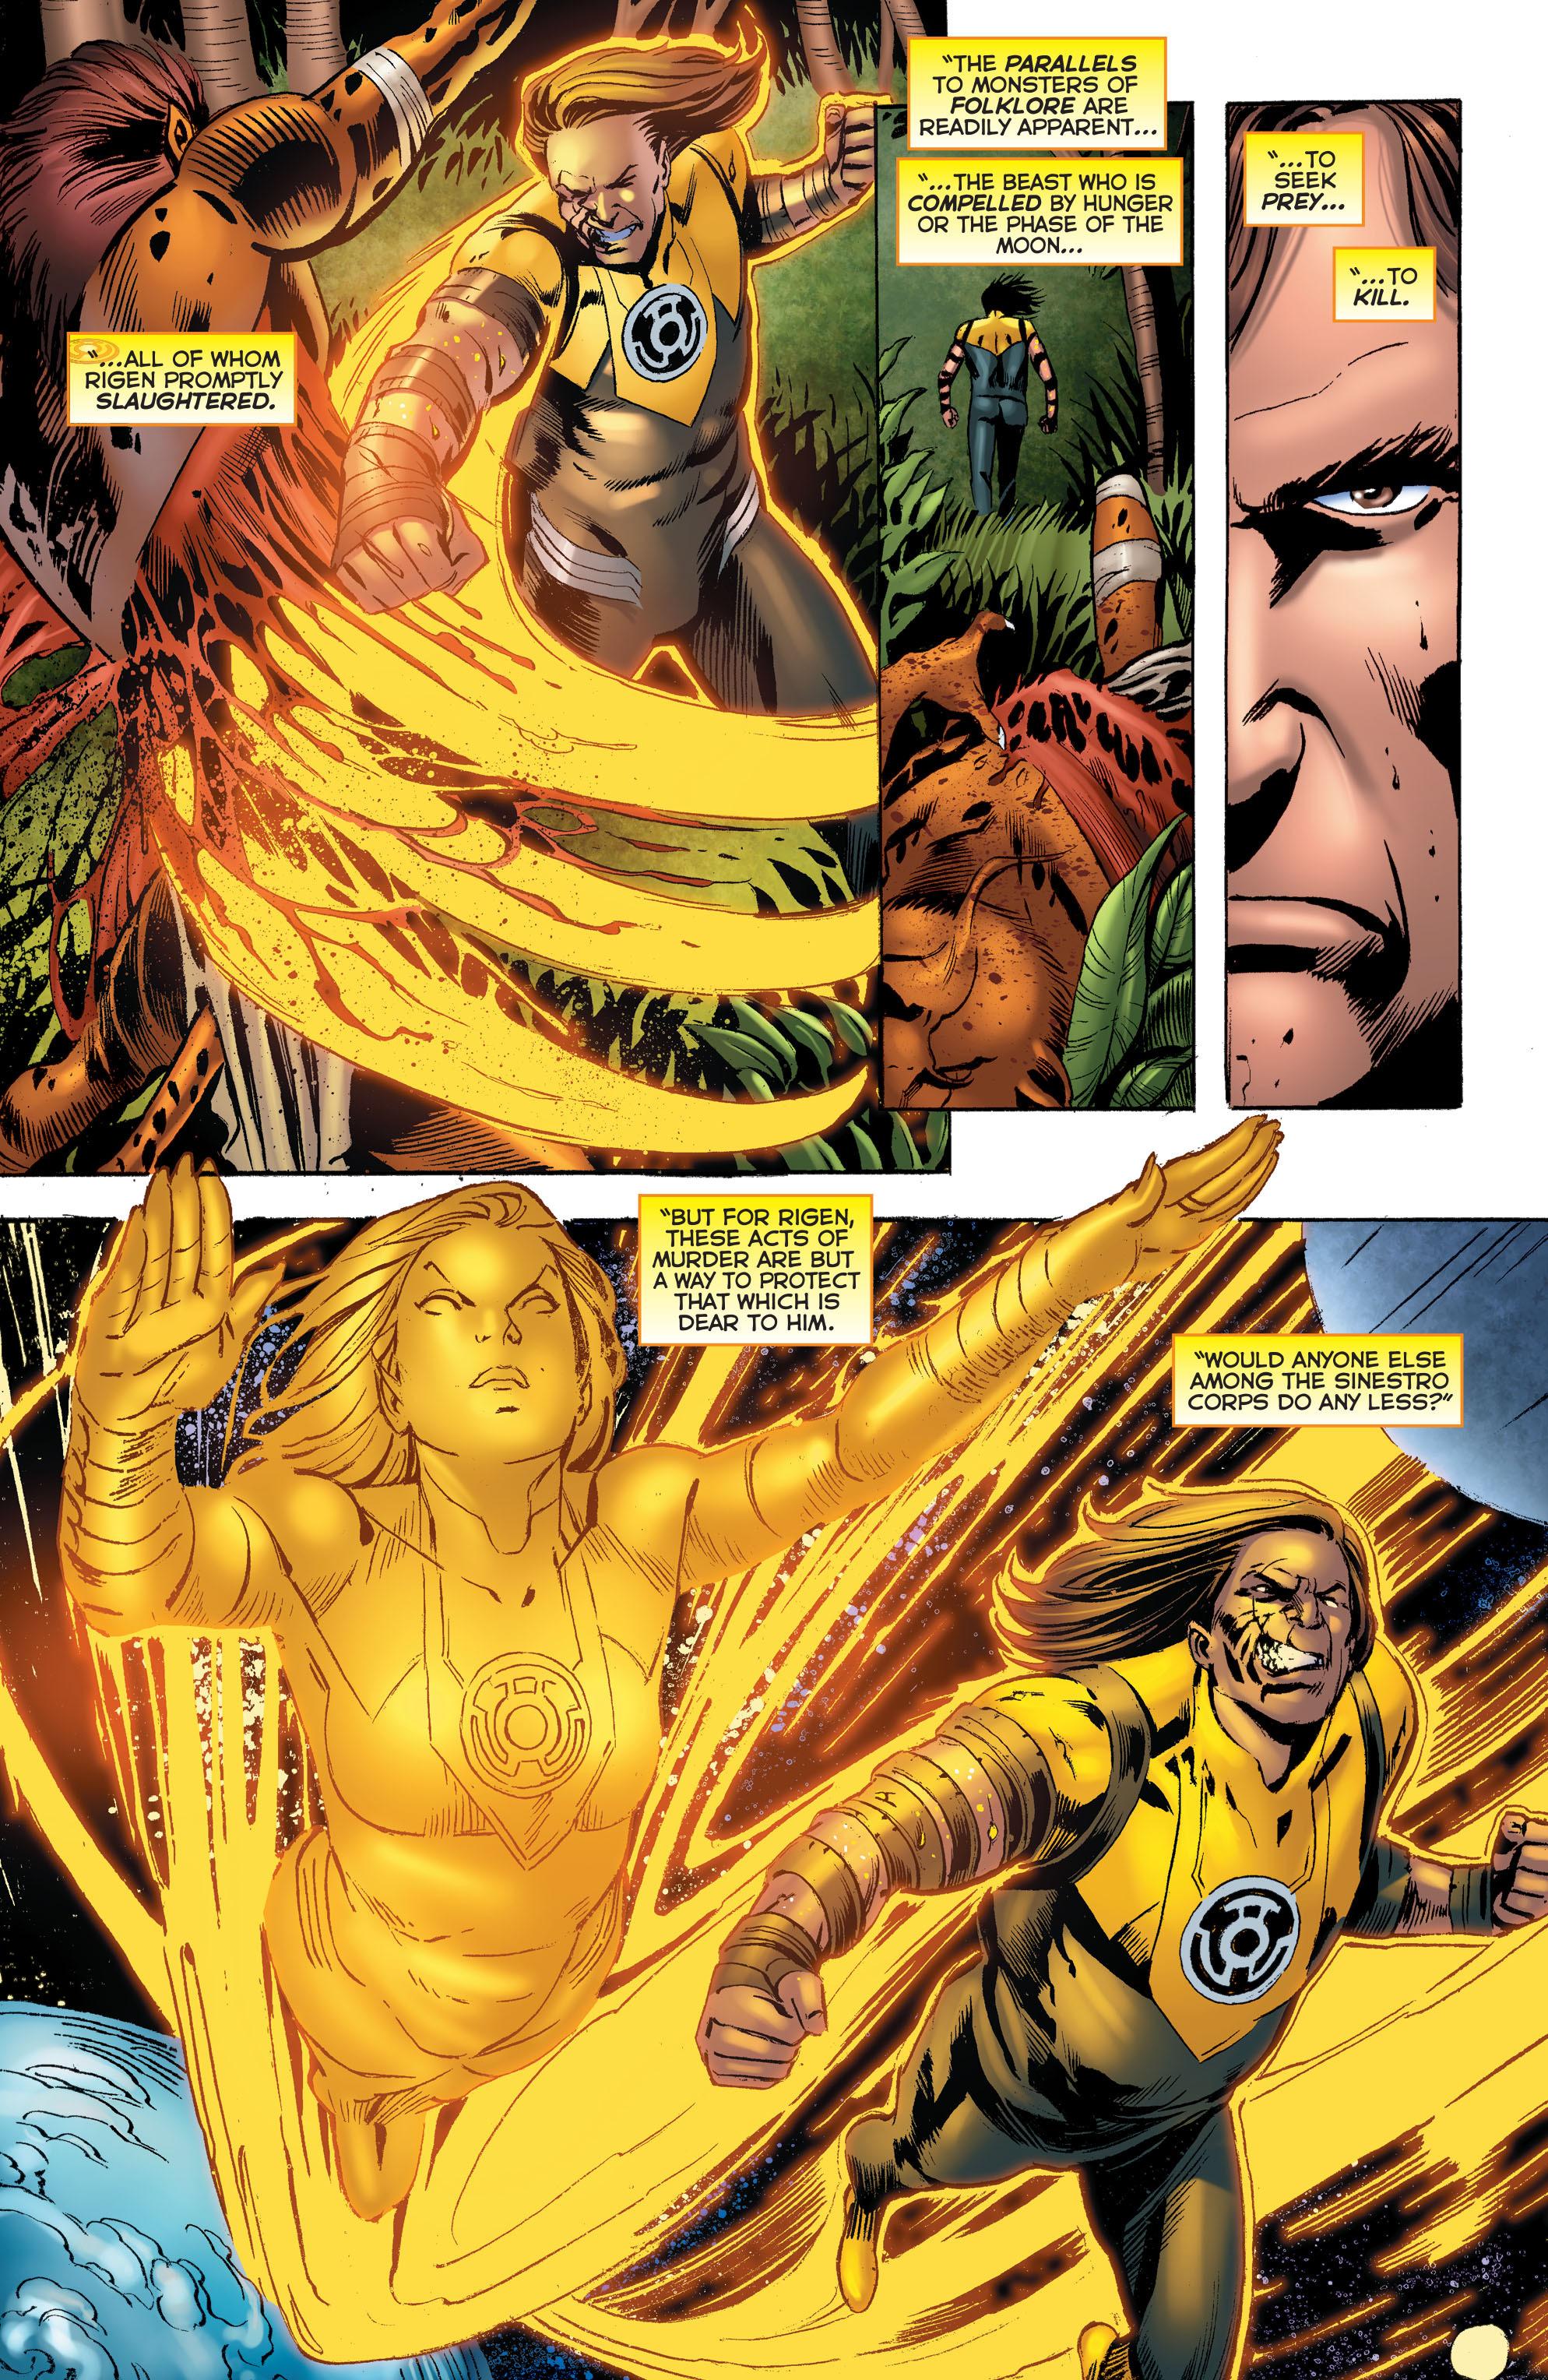 Read online Sinestro comic -  Issue # Annual 1 - 31